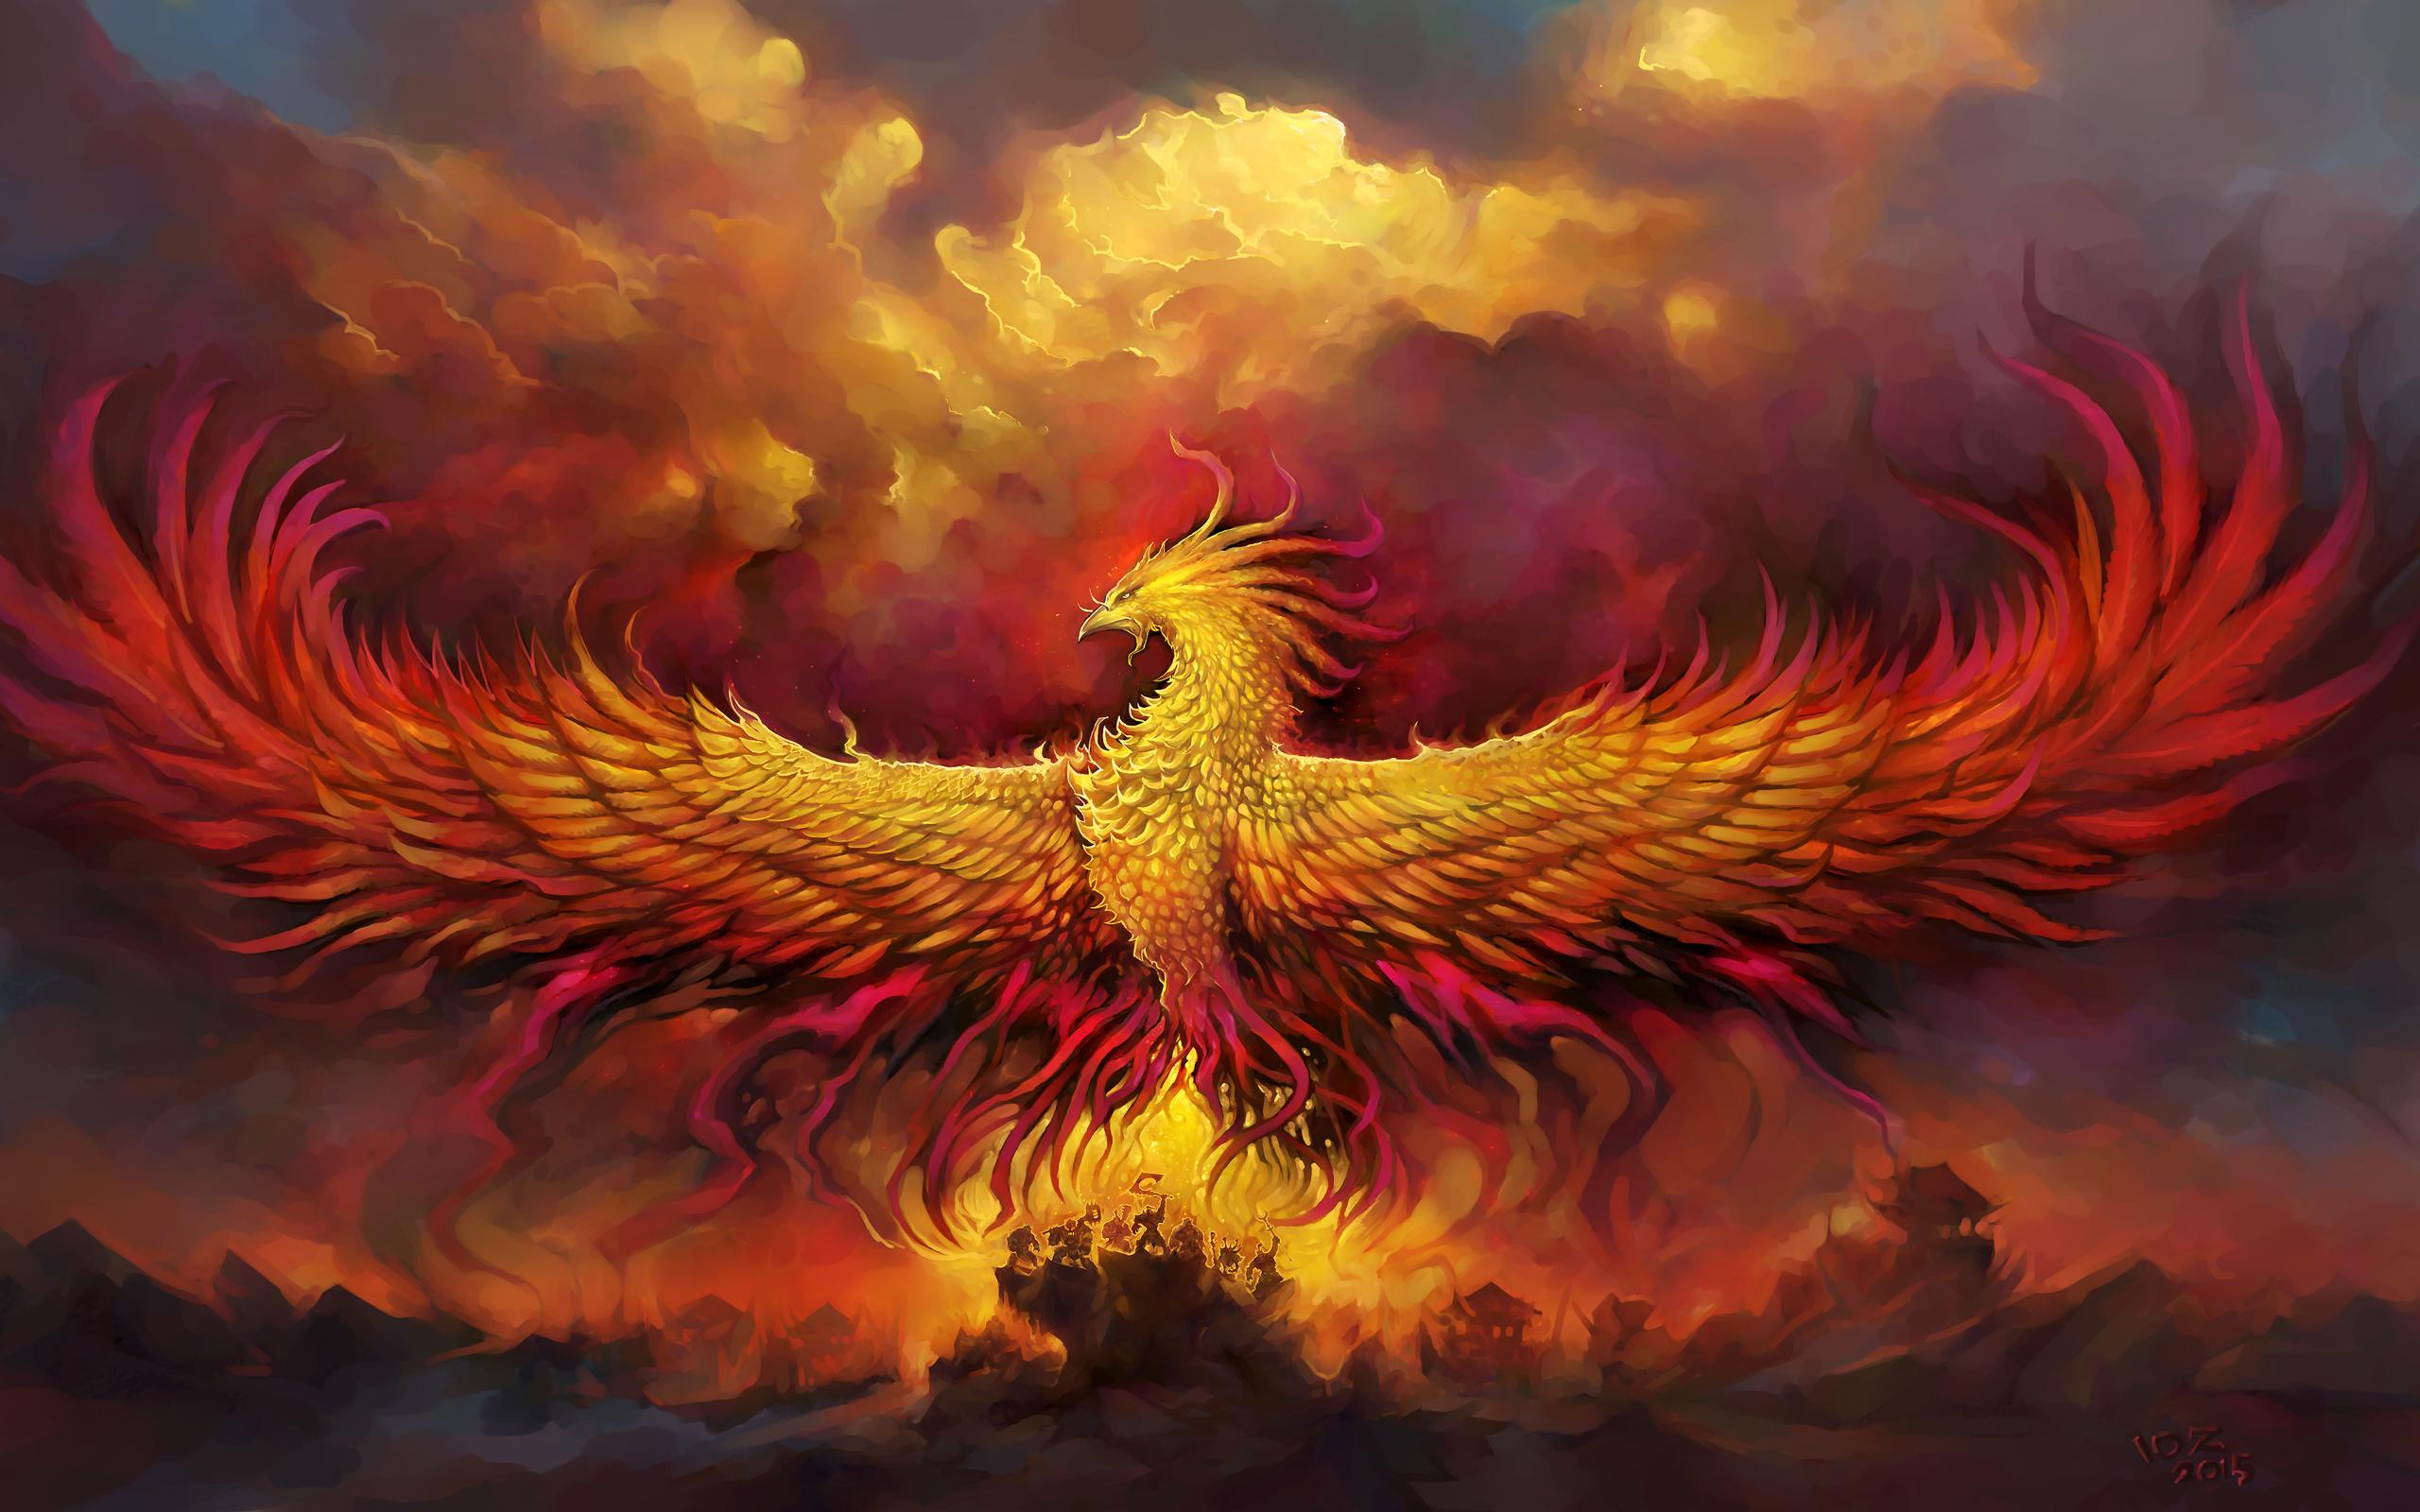 крылья, феникс, птица, огонь, арт